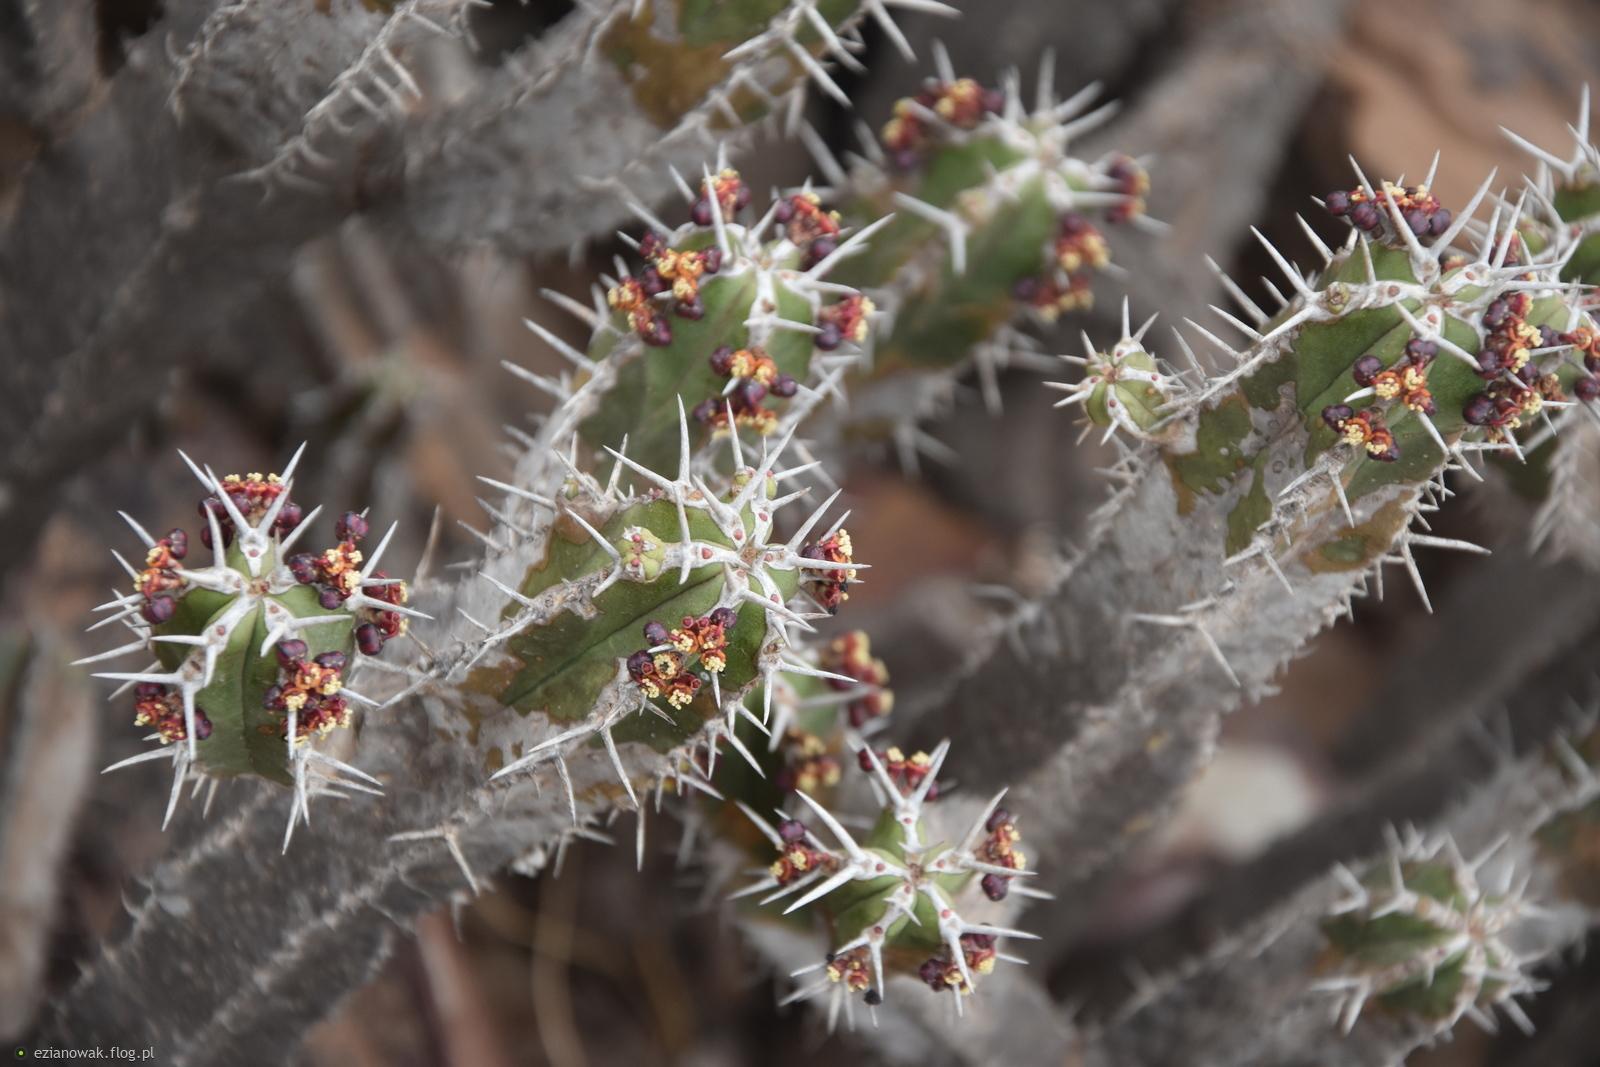 Marokańskie kaktusy